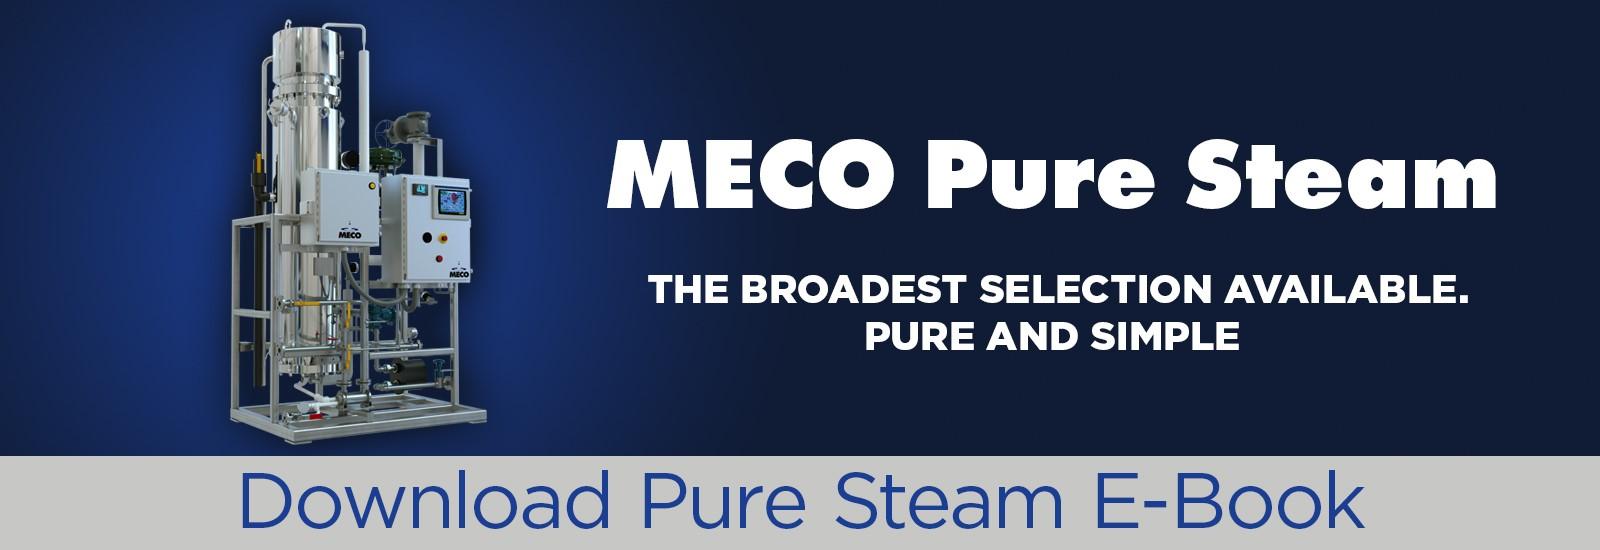 MECO-pure-steam-banner.jpg